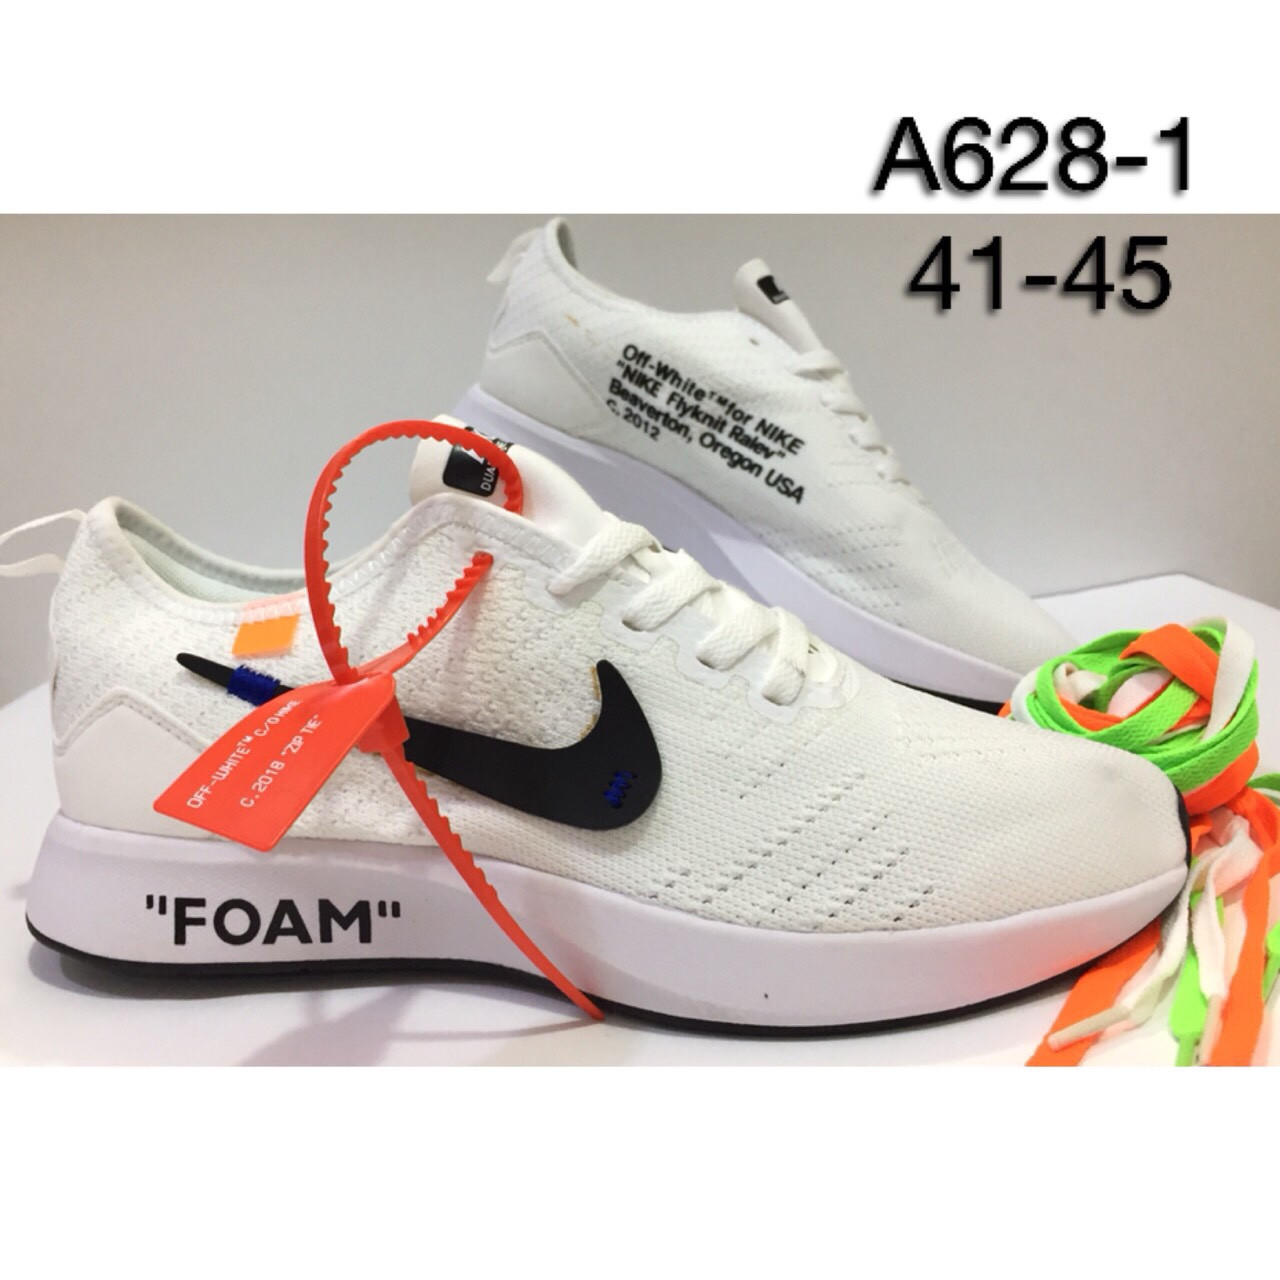 Мужские кроссовки Nike Foam оптом (41-45)